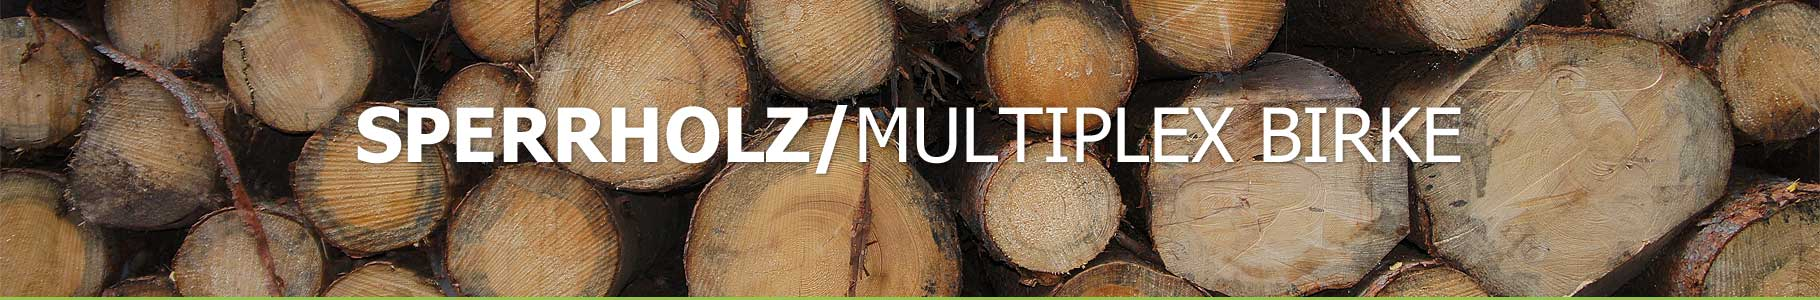 Sperrholz Multiplex Birke